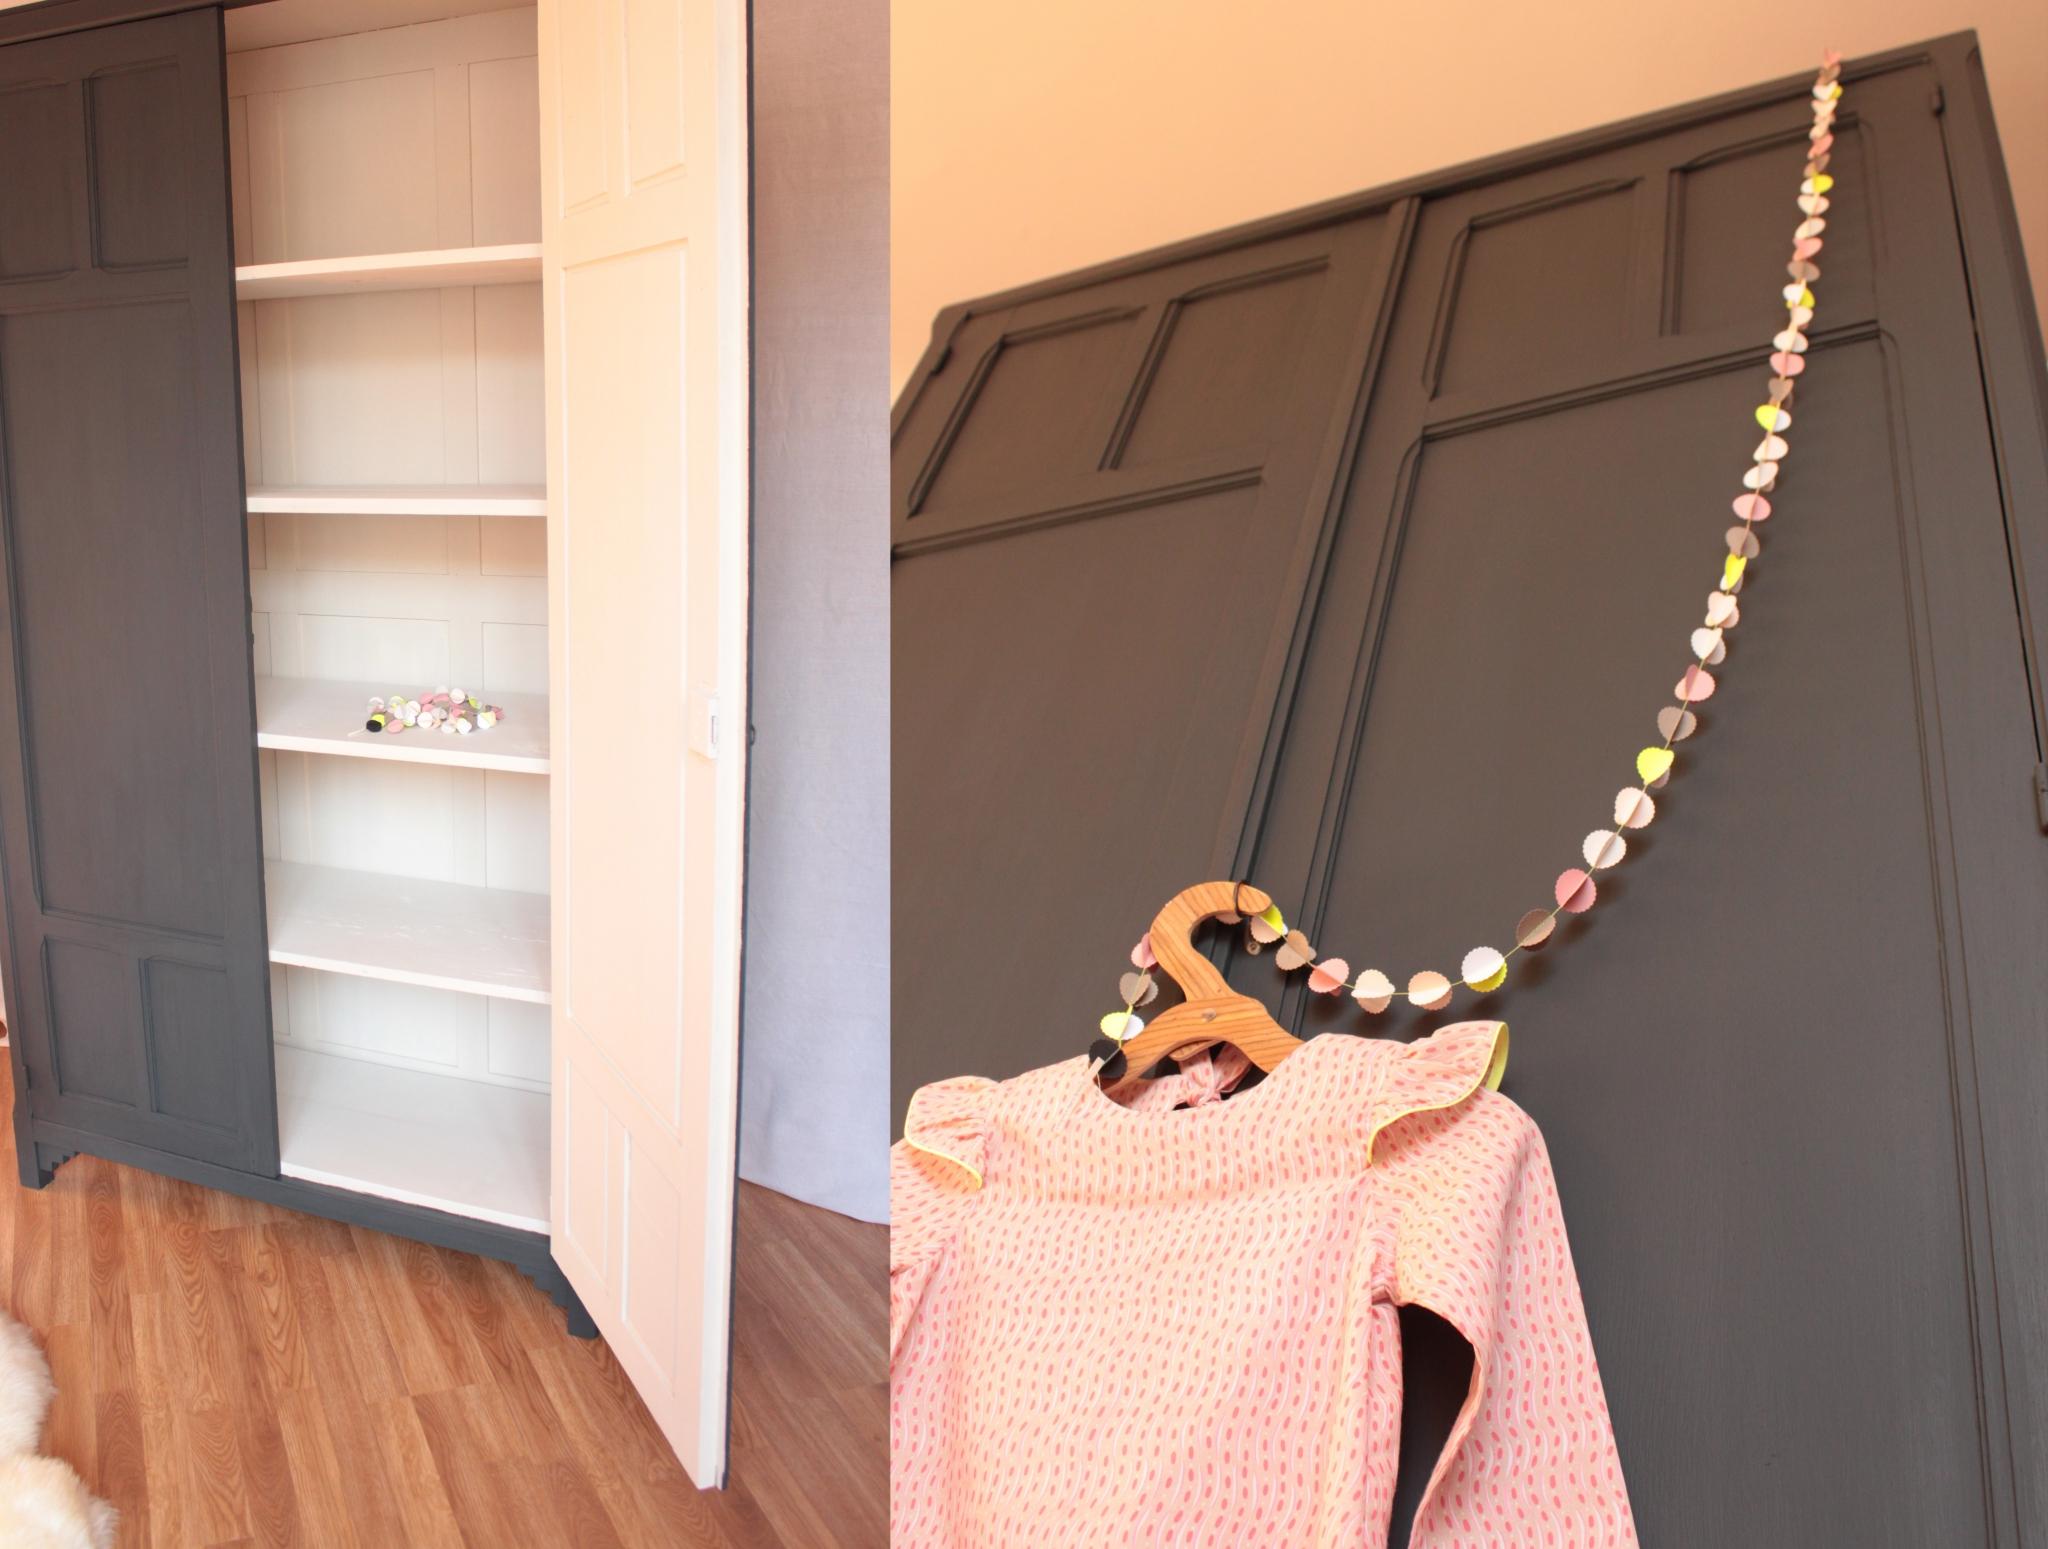 Grande armoire parisienne TRENDY LITTLE